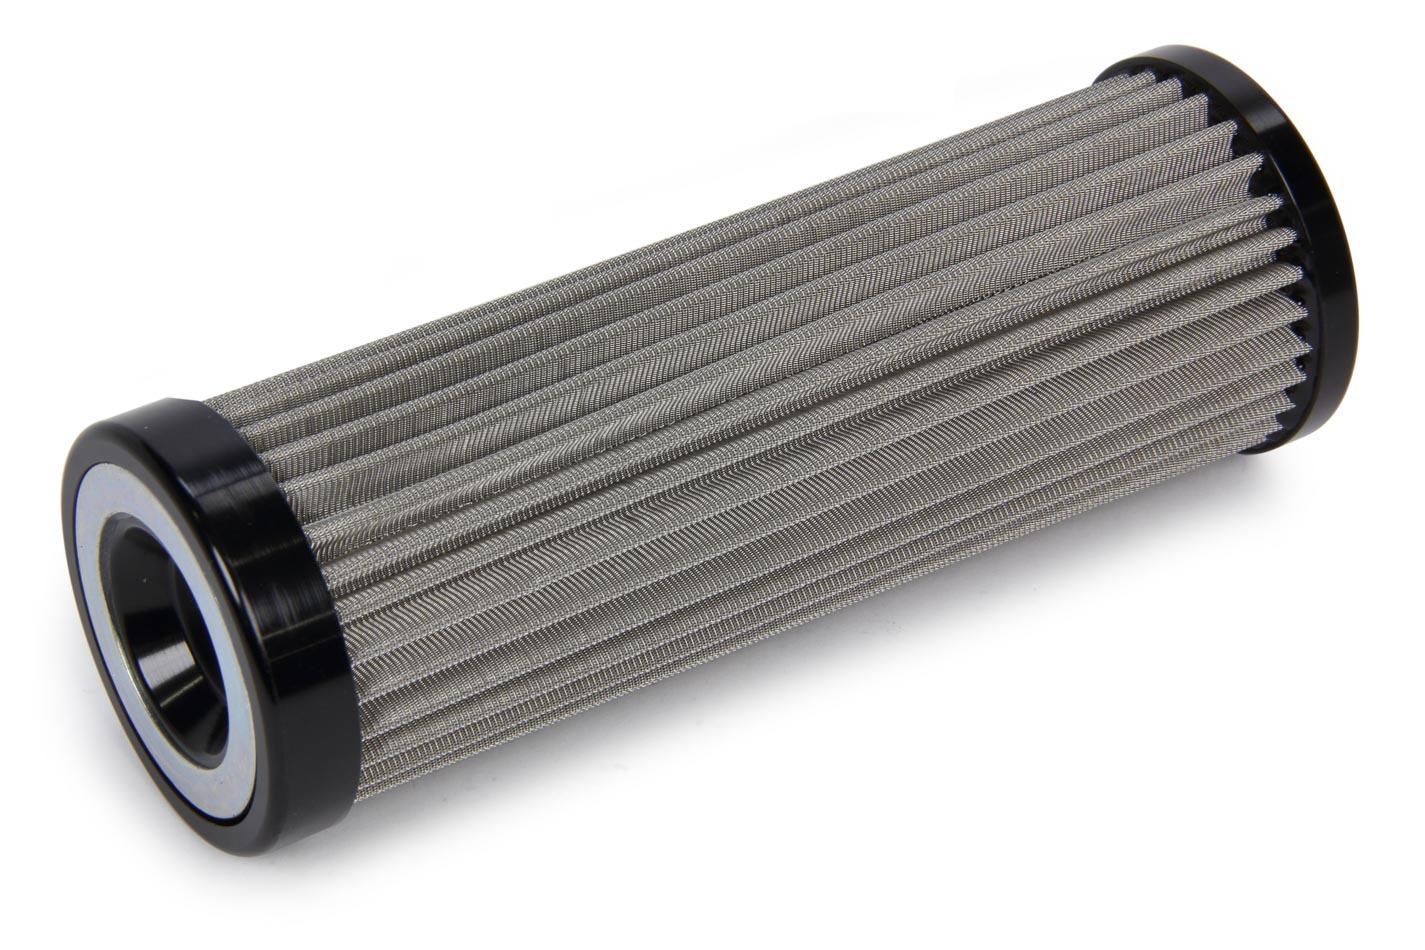 Ti22 Performance 5529 Fuel Filter Element, 100 Micron, Stainless Element, Replacement, Ti22 Fuel Filters, Each